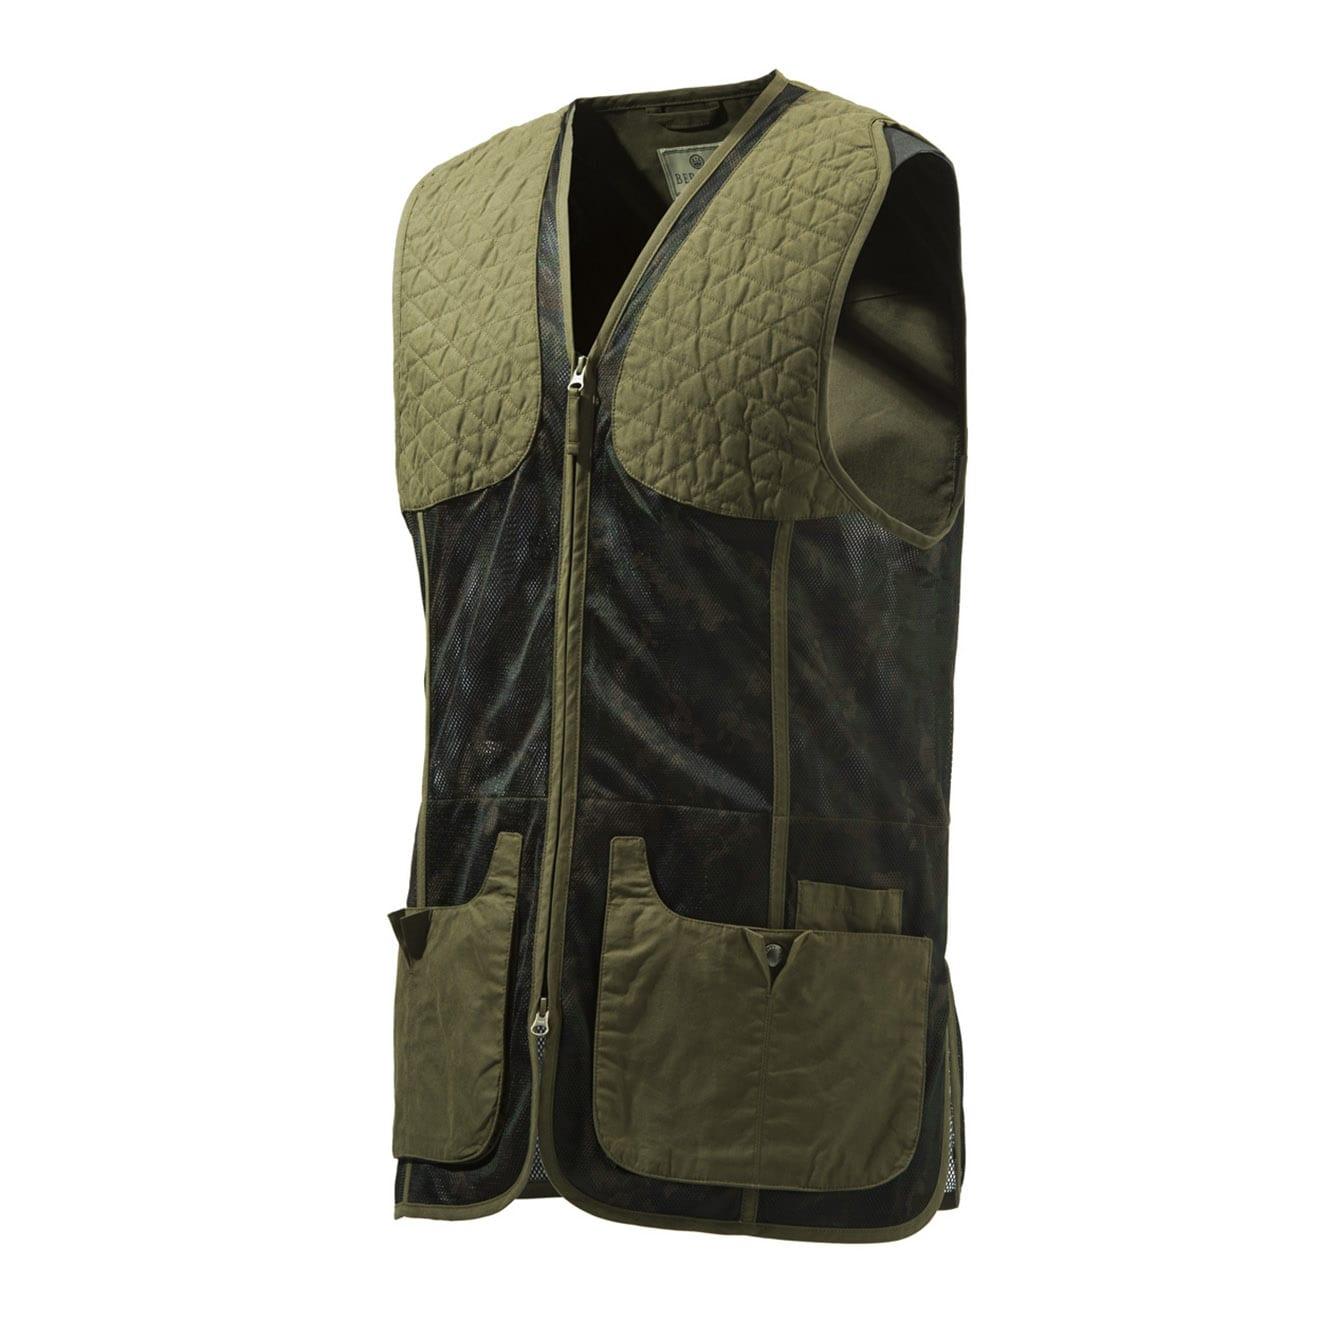 Beretta Urban Camo Mesh Shooting Vest